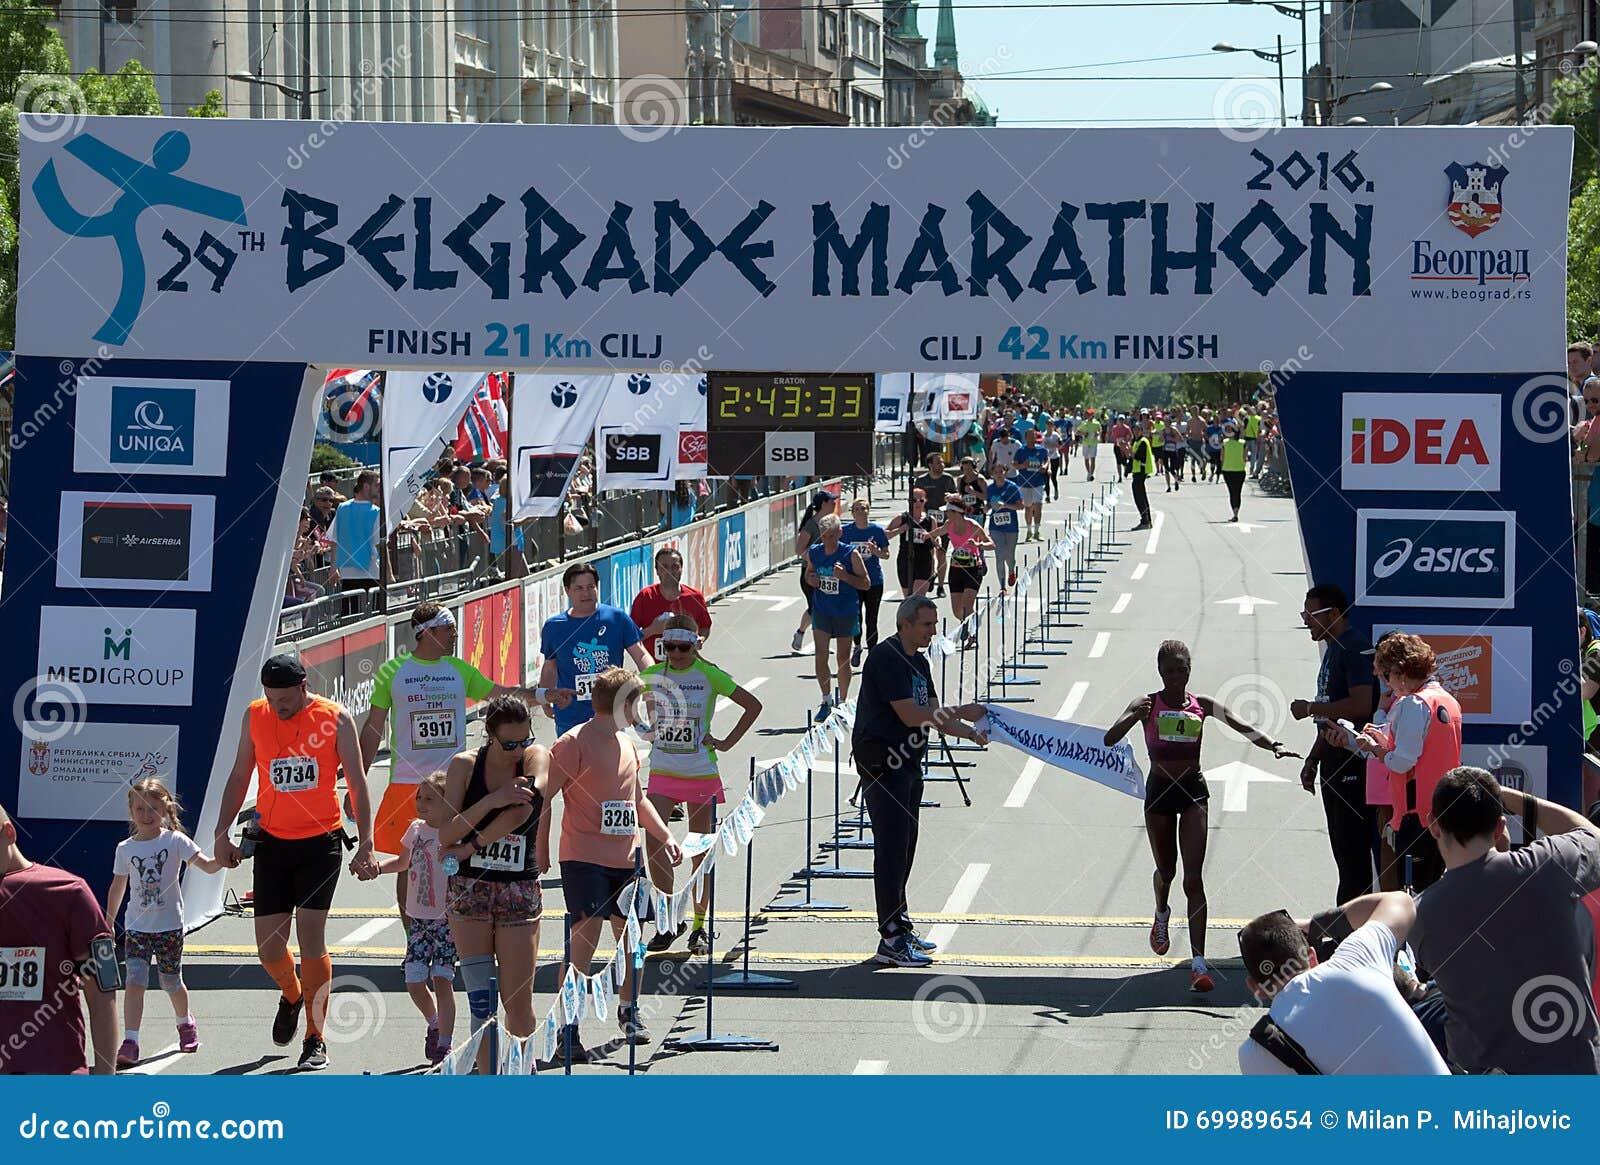 Winner of the marathon for woman